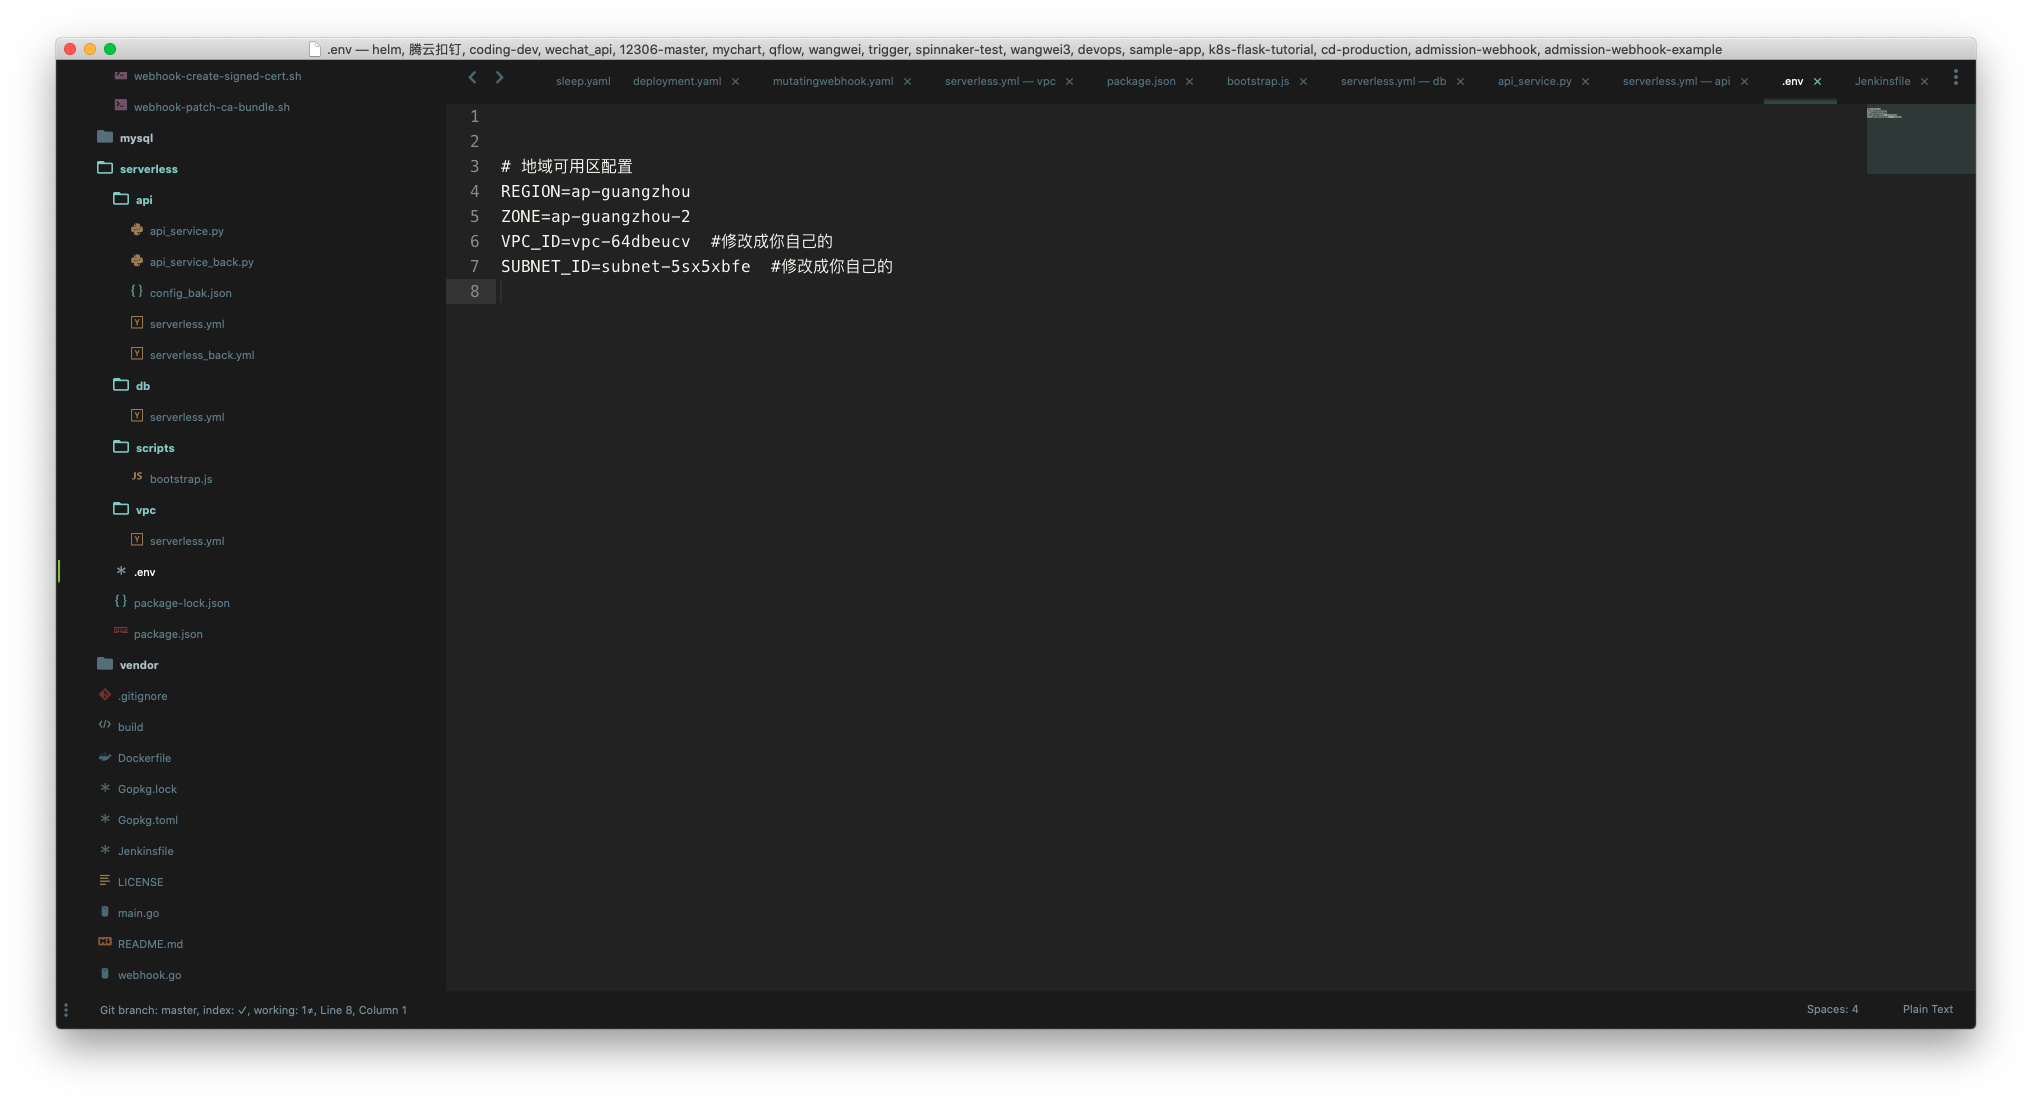 Kubernetes 兩步驗證 - 使用 Serverless 實現動態准入控制